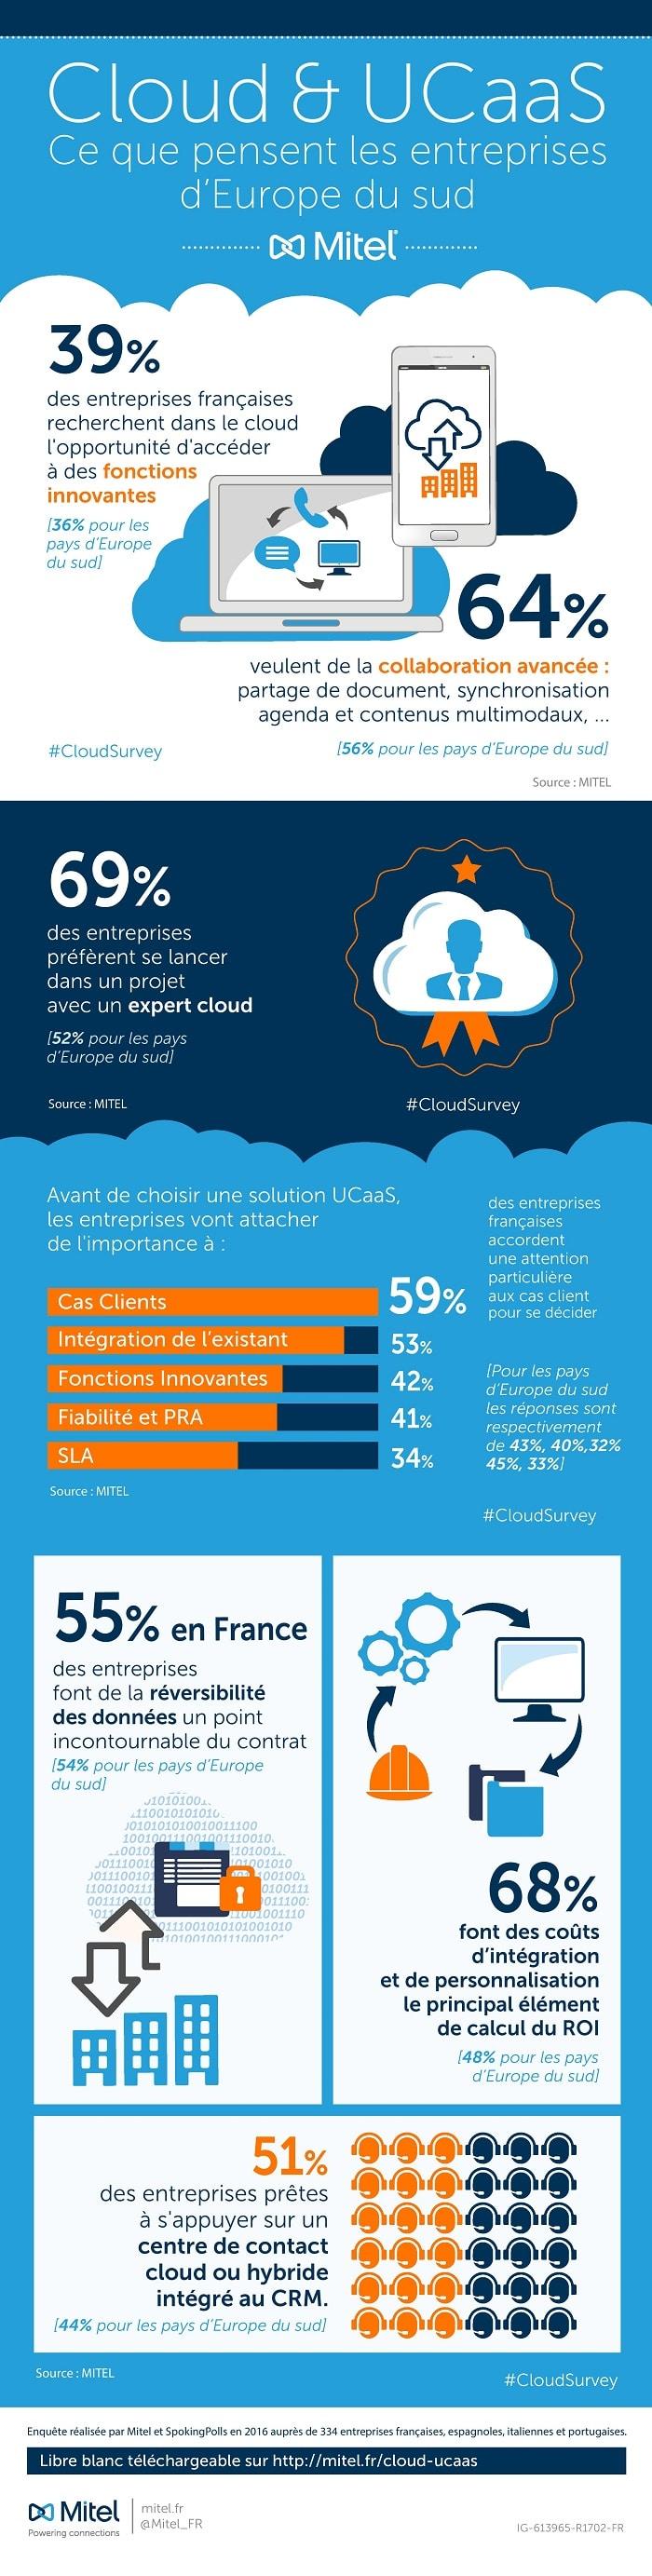 Mitel - infographie Cloud UCaaS-700